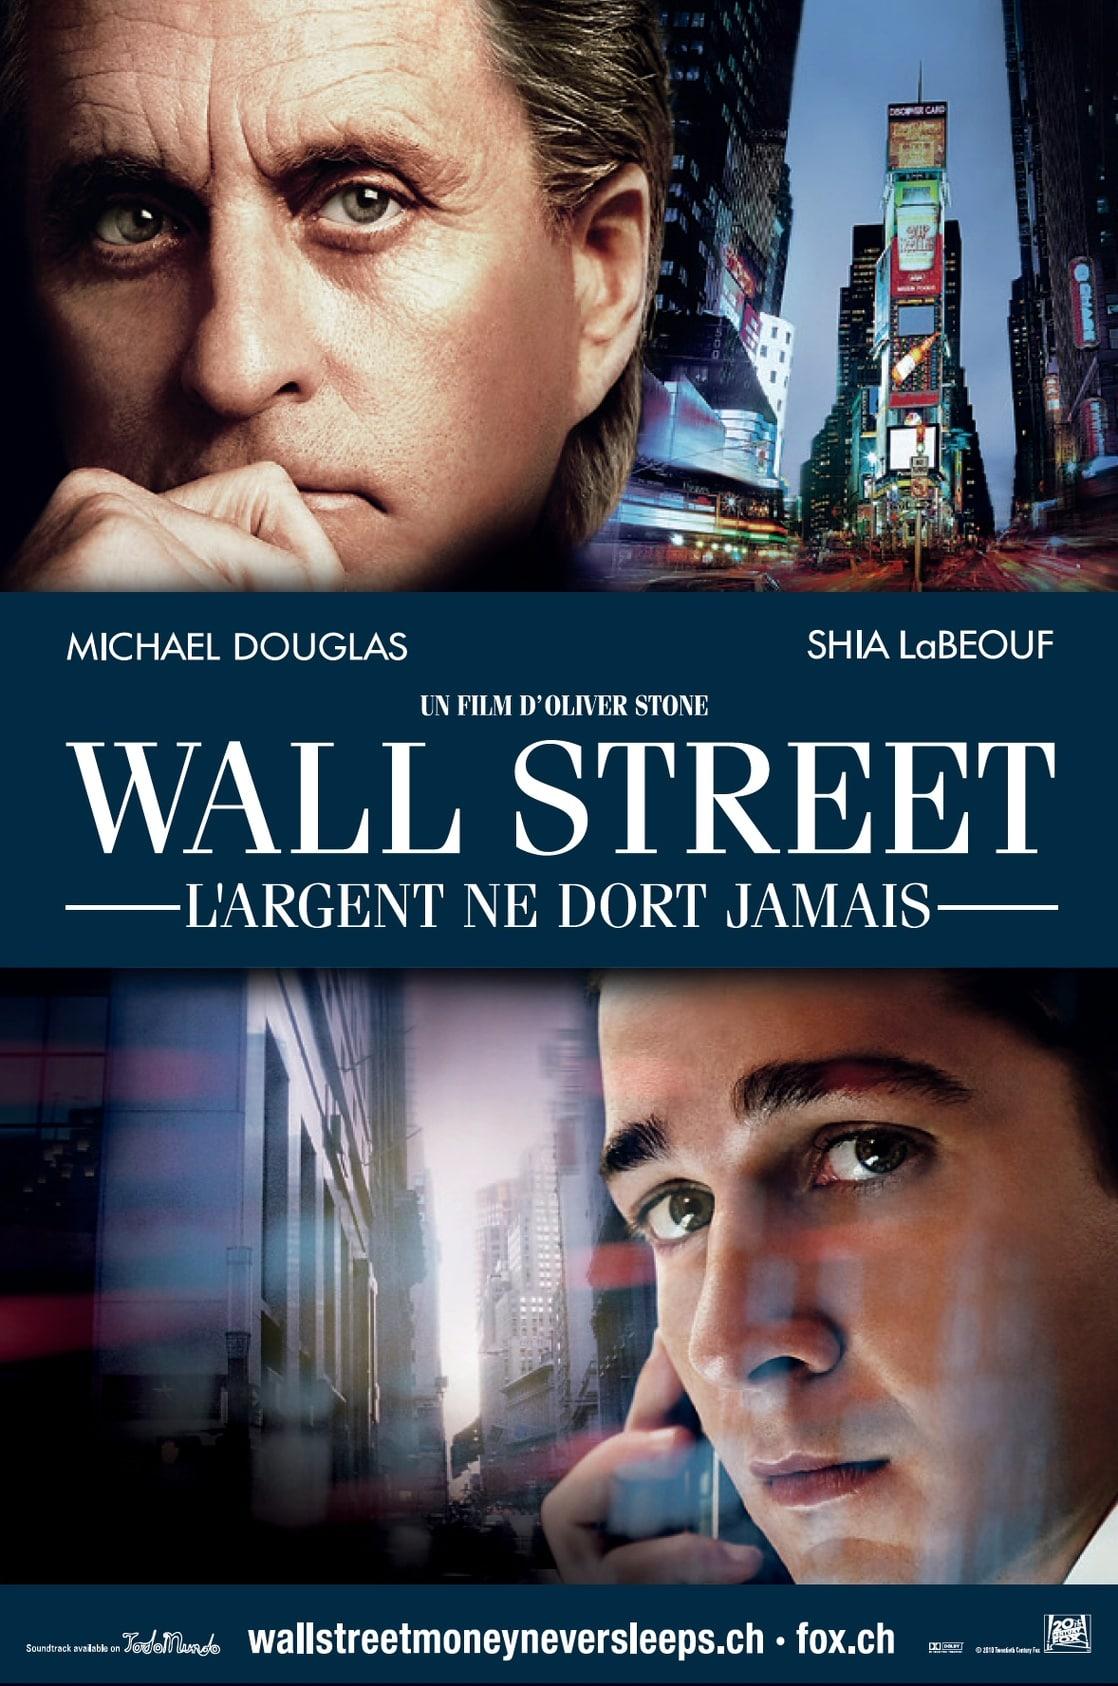 WALL STREET: MONEY NEVER SLEEPS O.S.T. - Wall Street ...